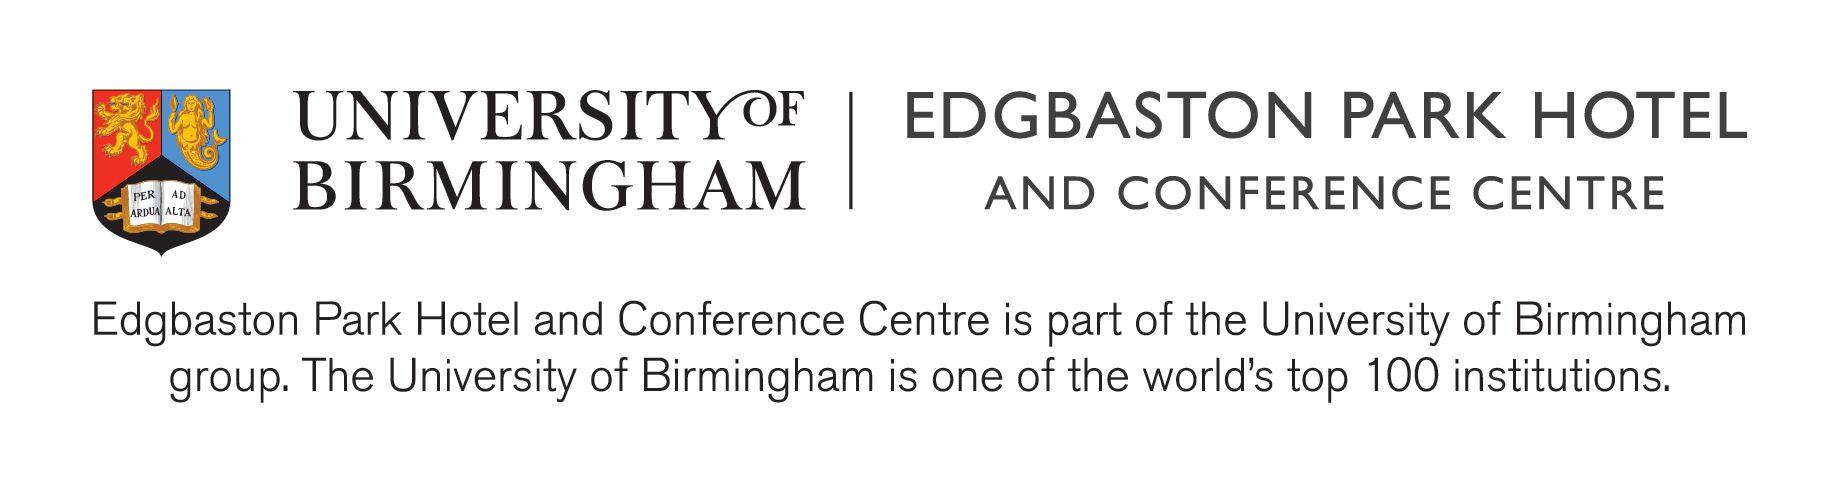 Edgbaston Park Hotel and  Conference Centre